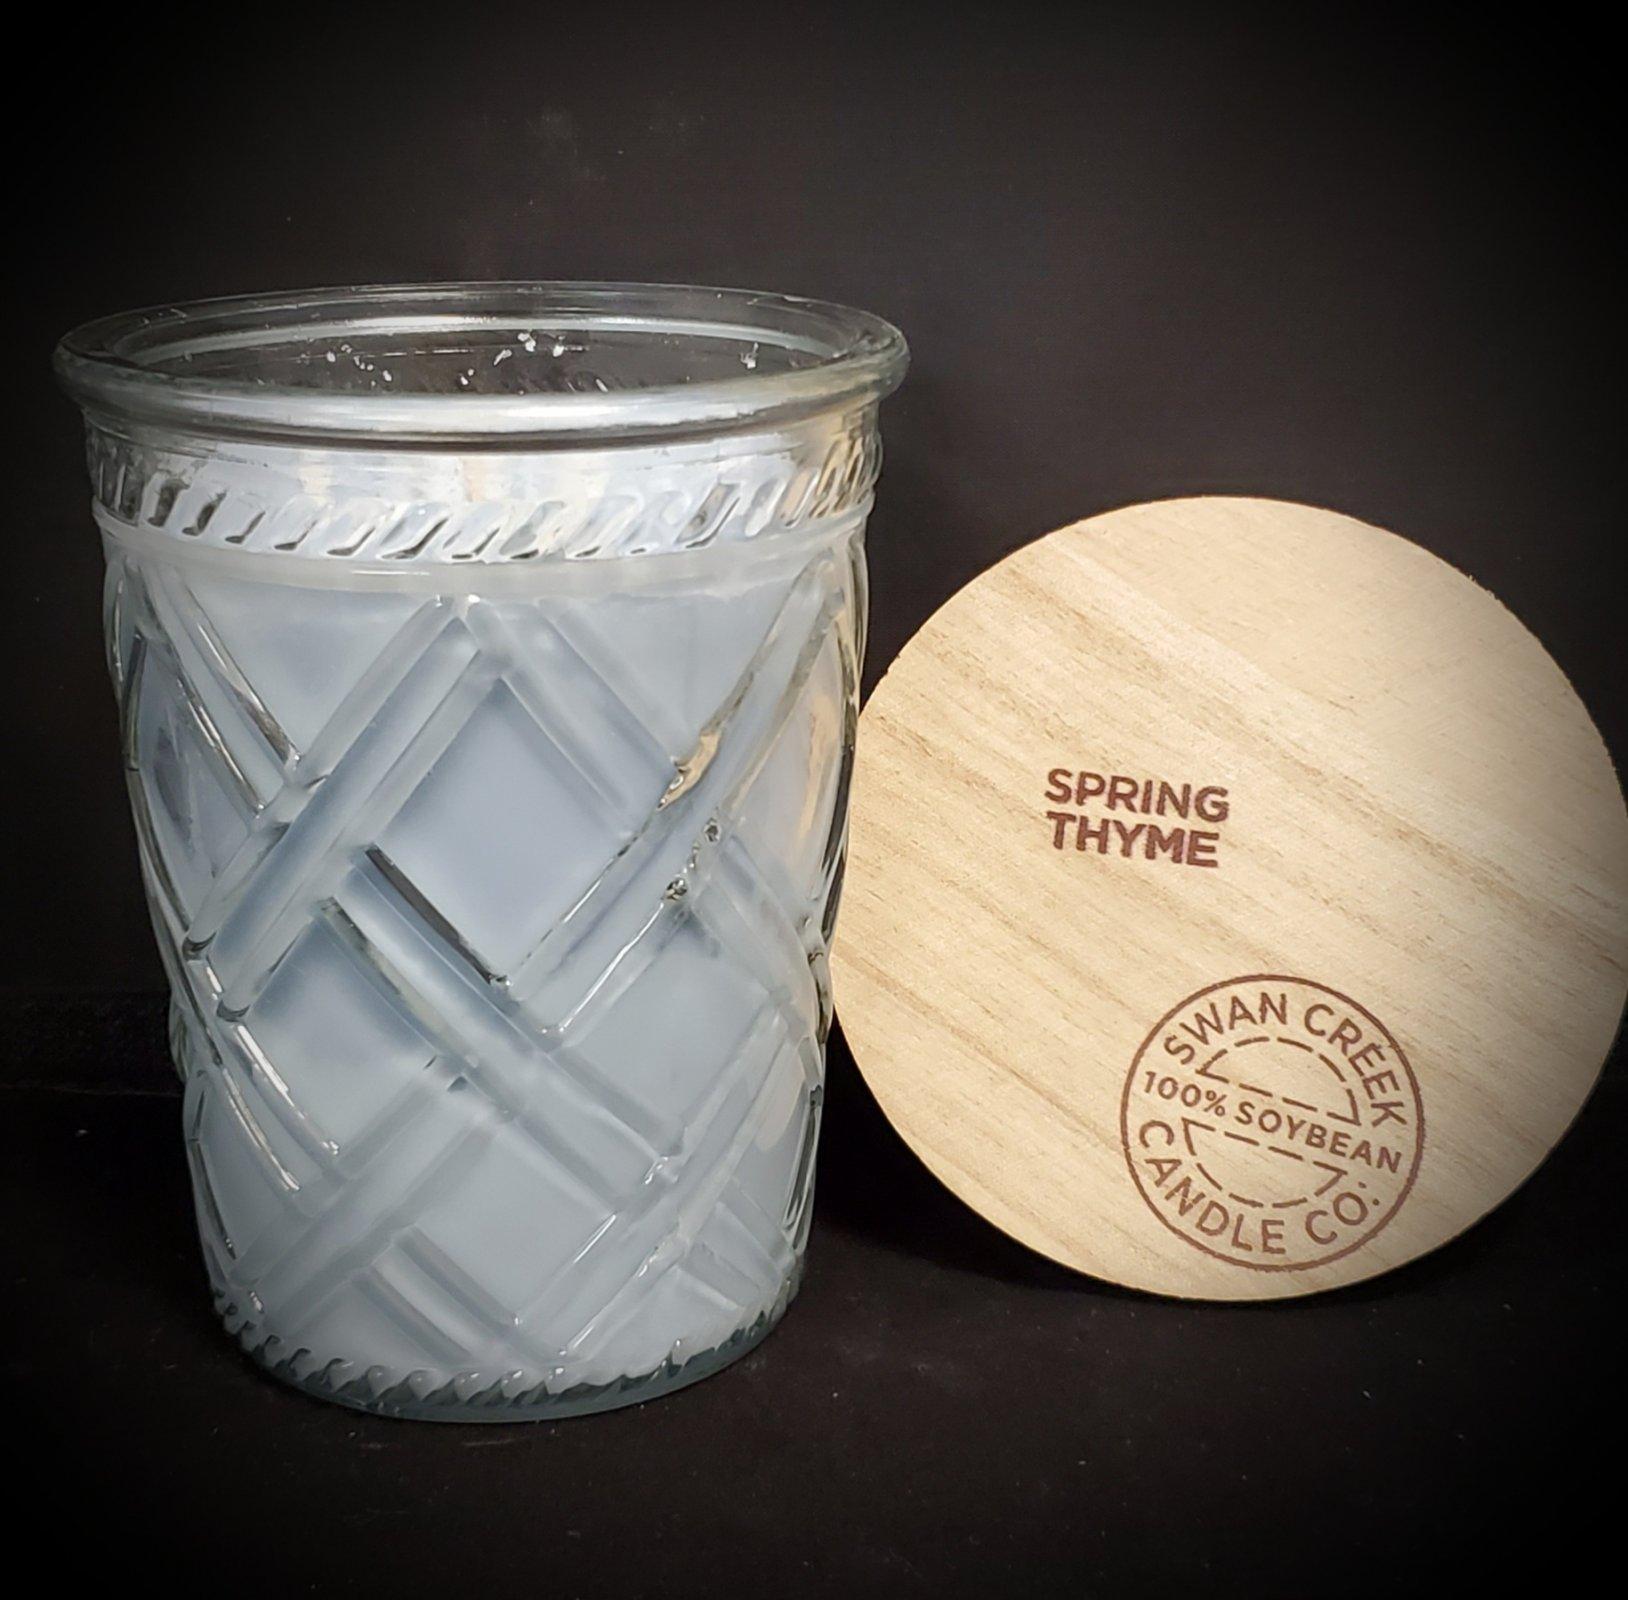 Swan Creek Candles Timeless Jar - Spring Thyme